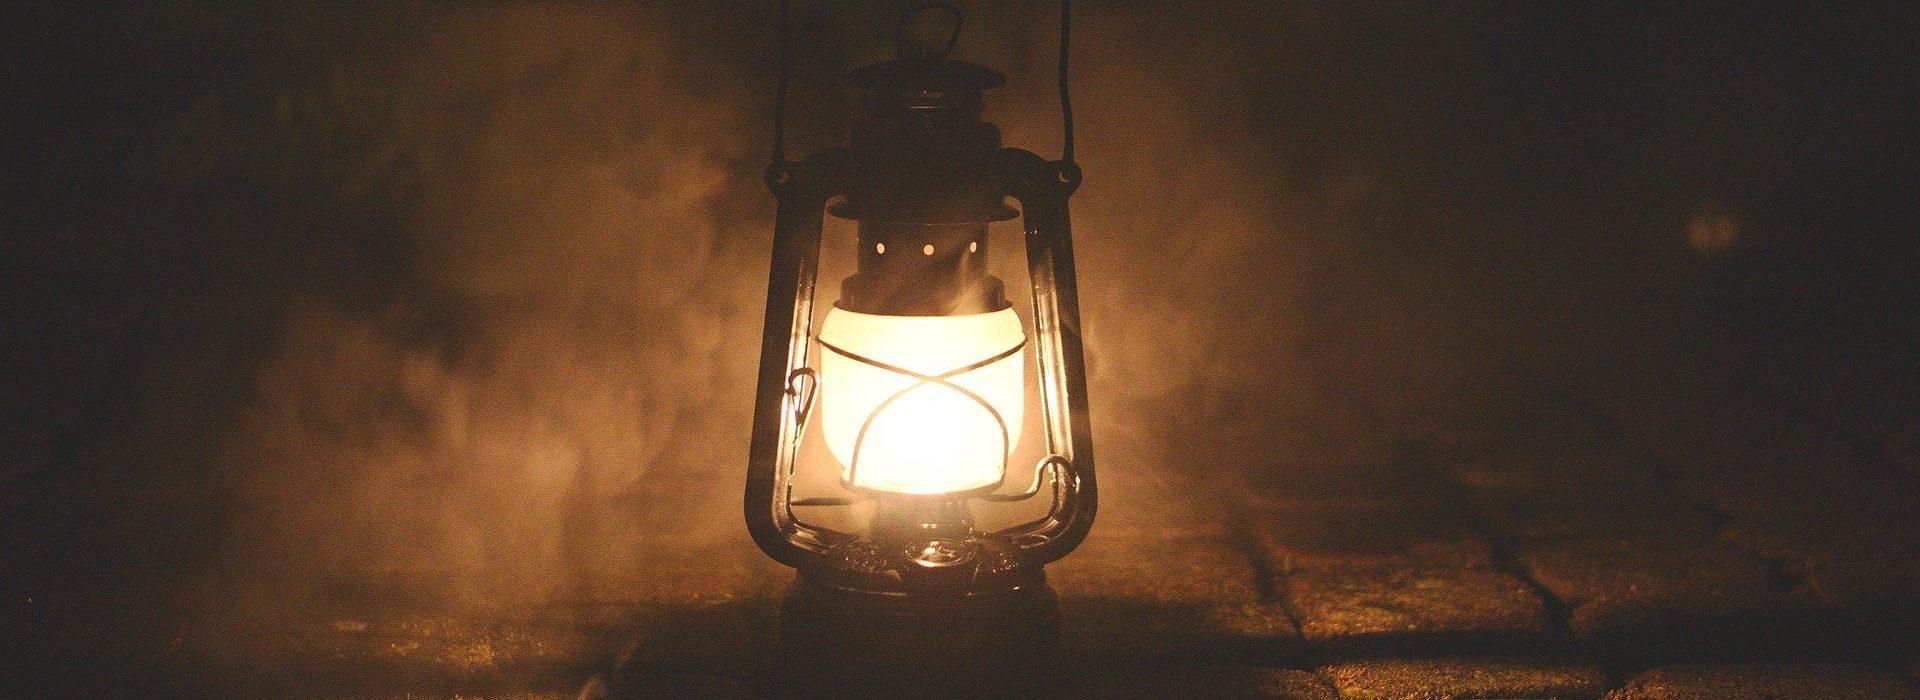 lantern, fellowship of the mystery,